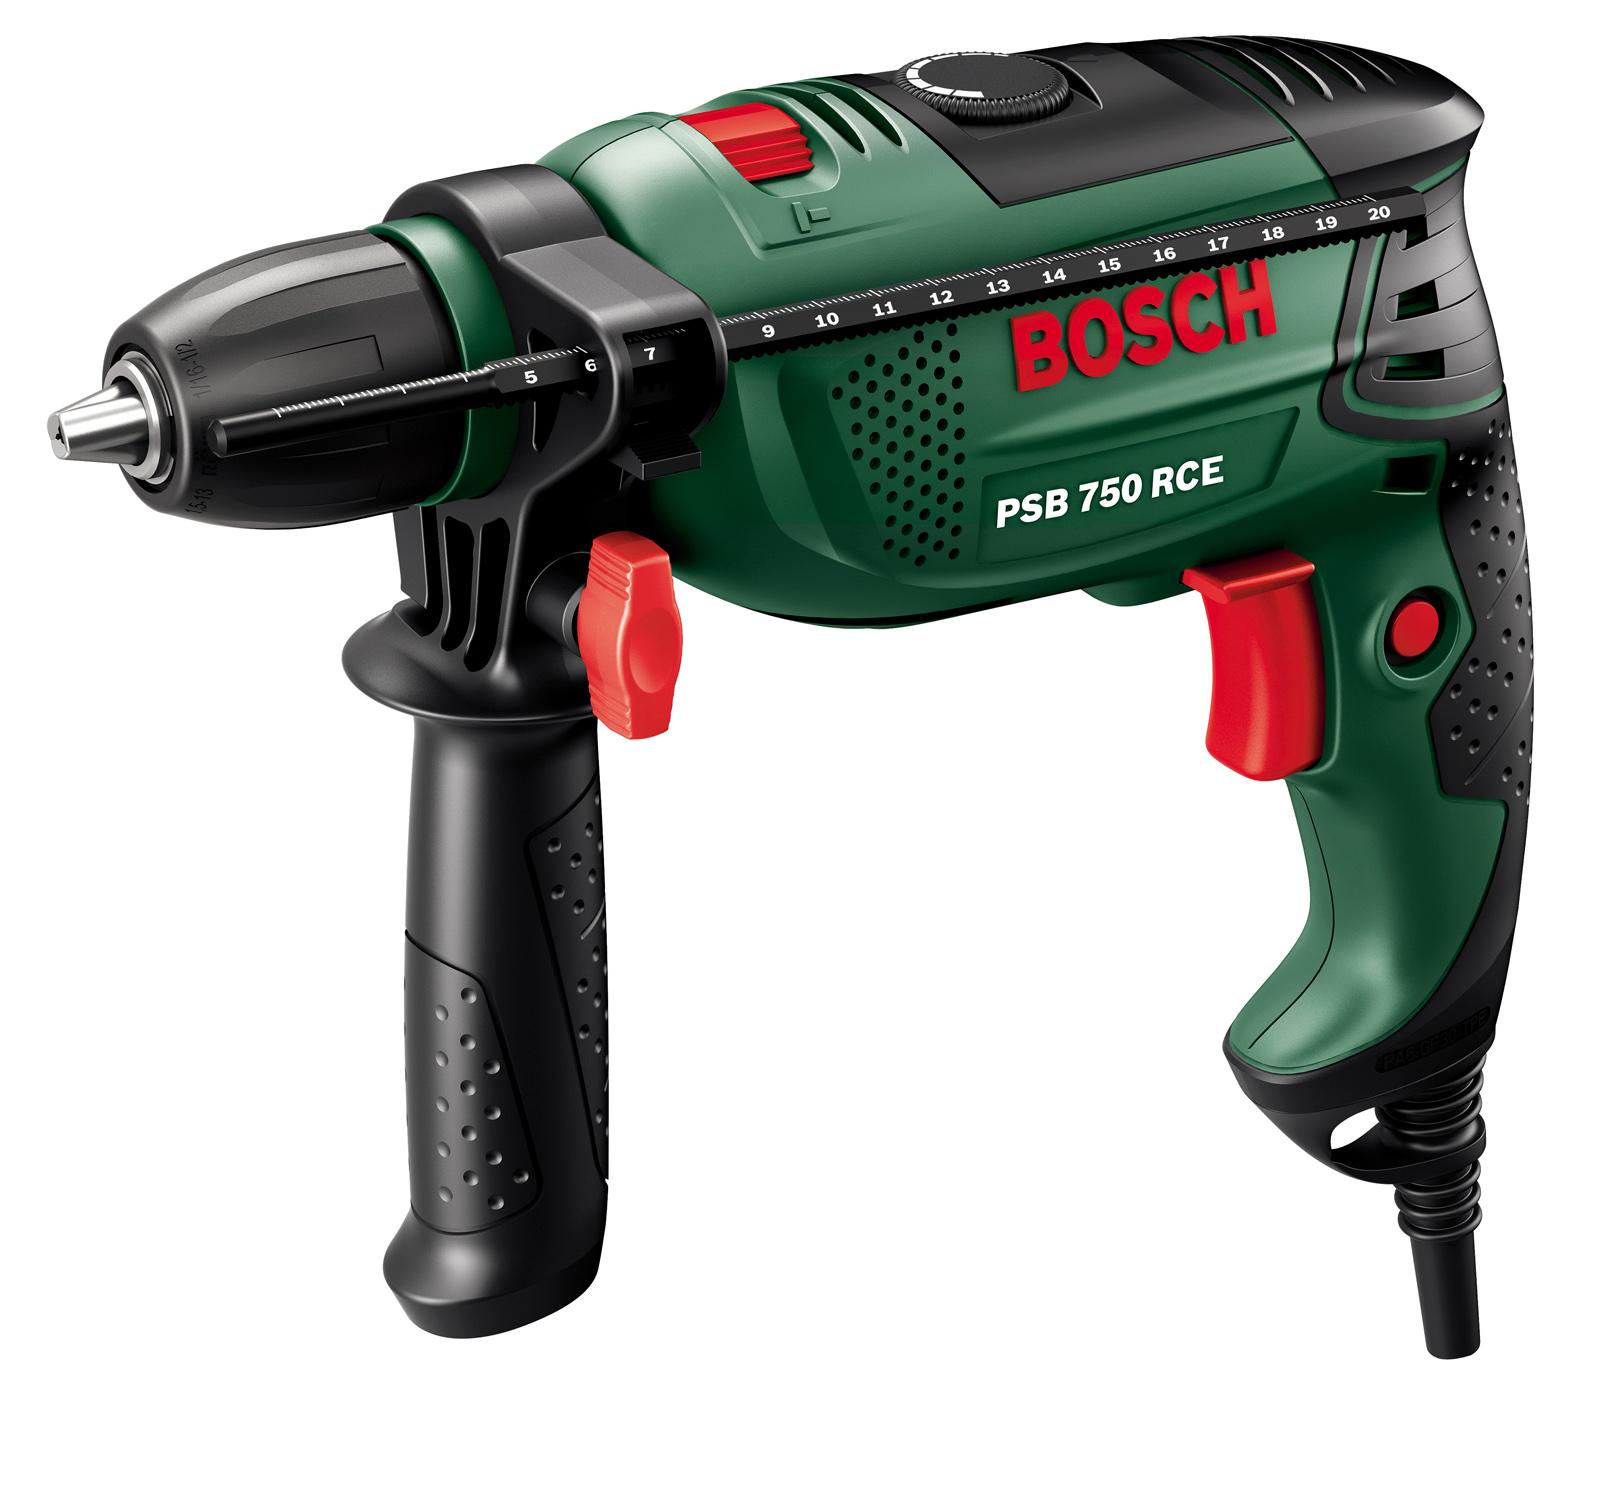 Дрель ударная Bosch Psb 750 rce (compact)(0.603.128.520) дрель bosch psb 530 re